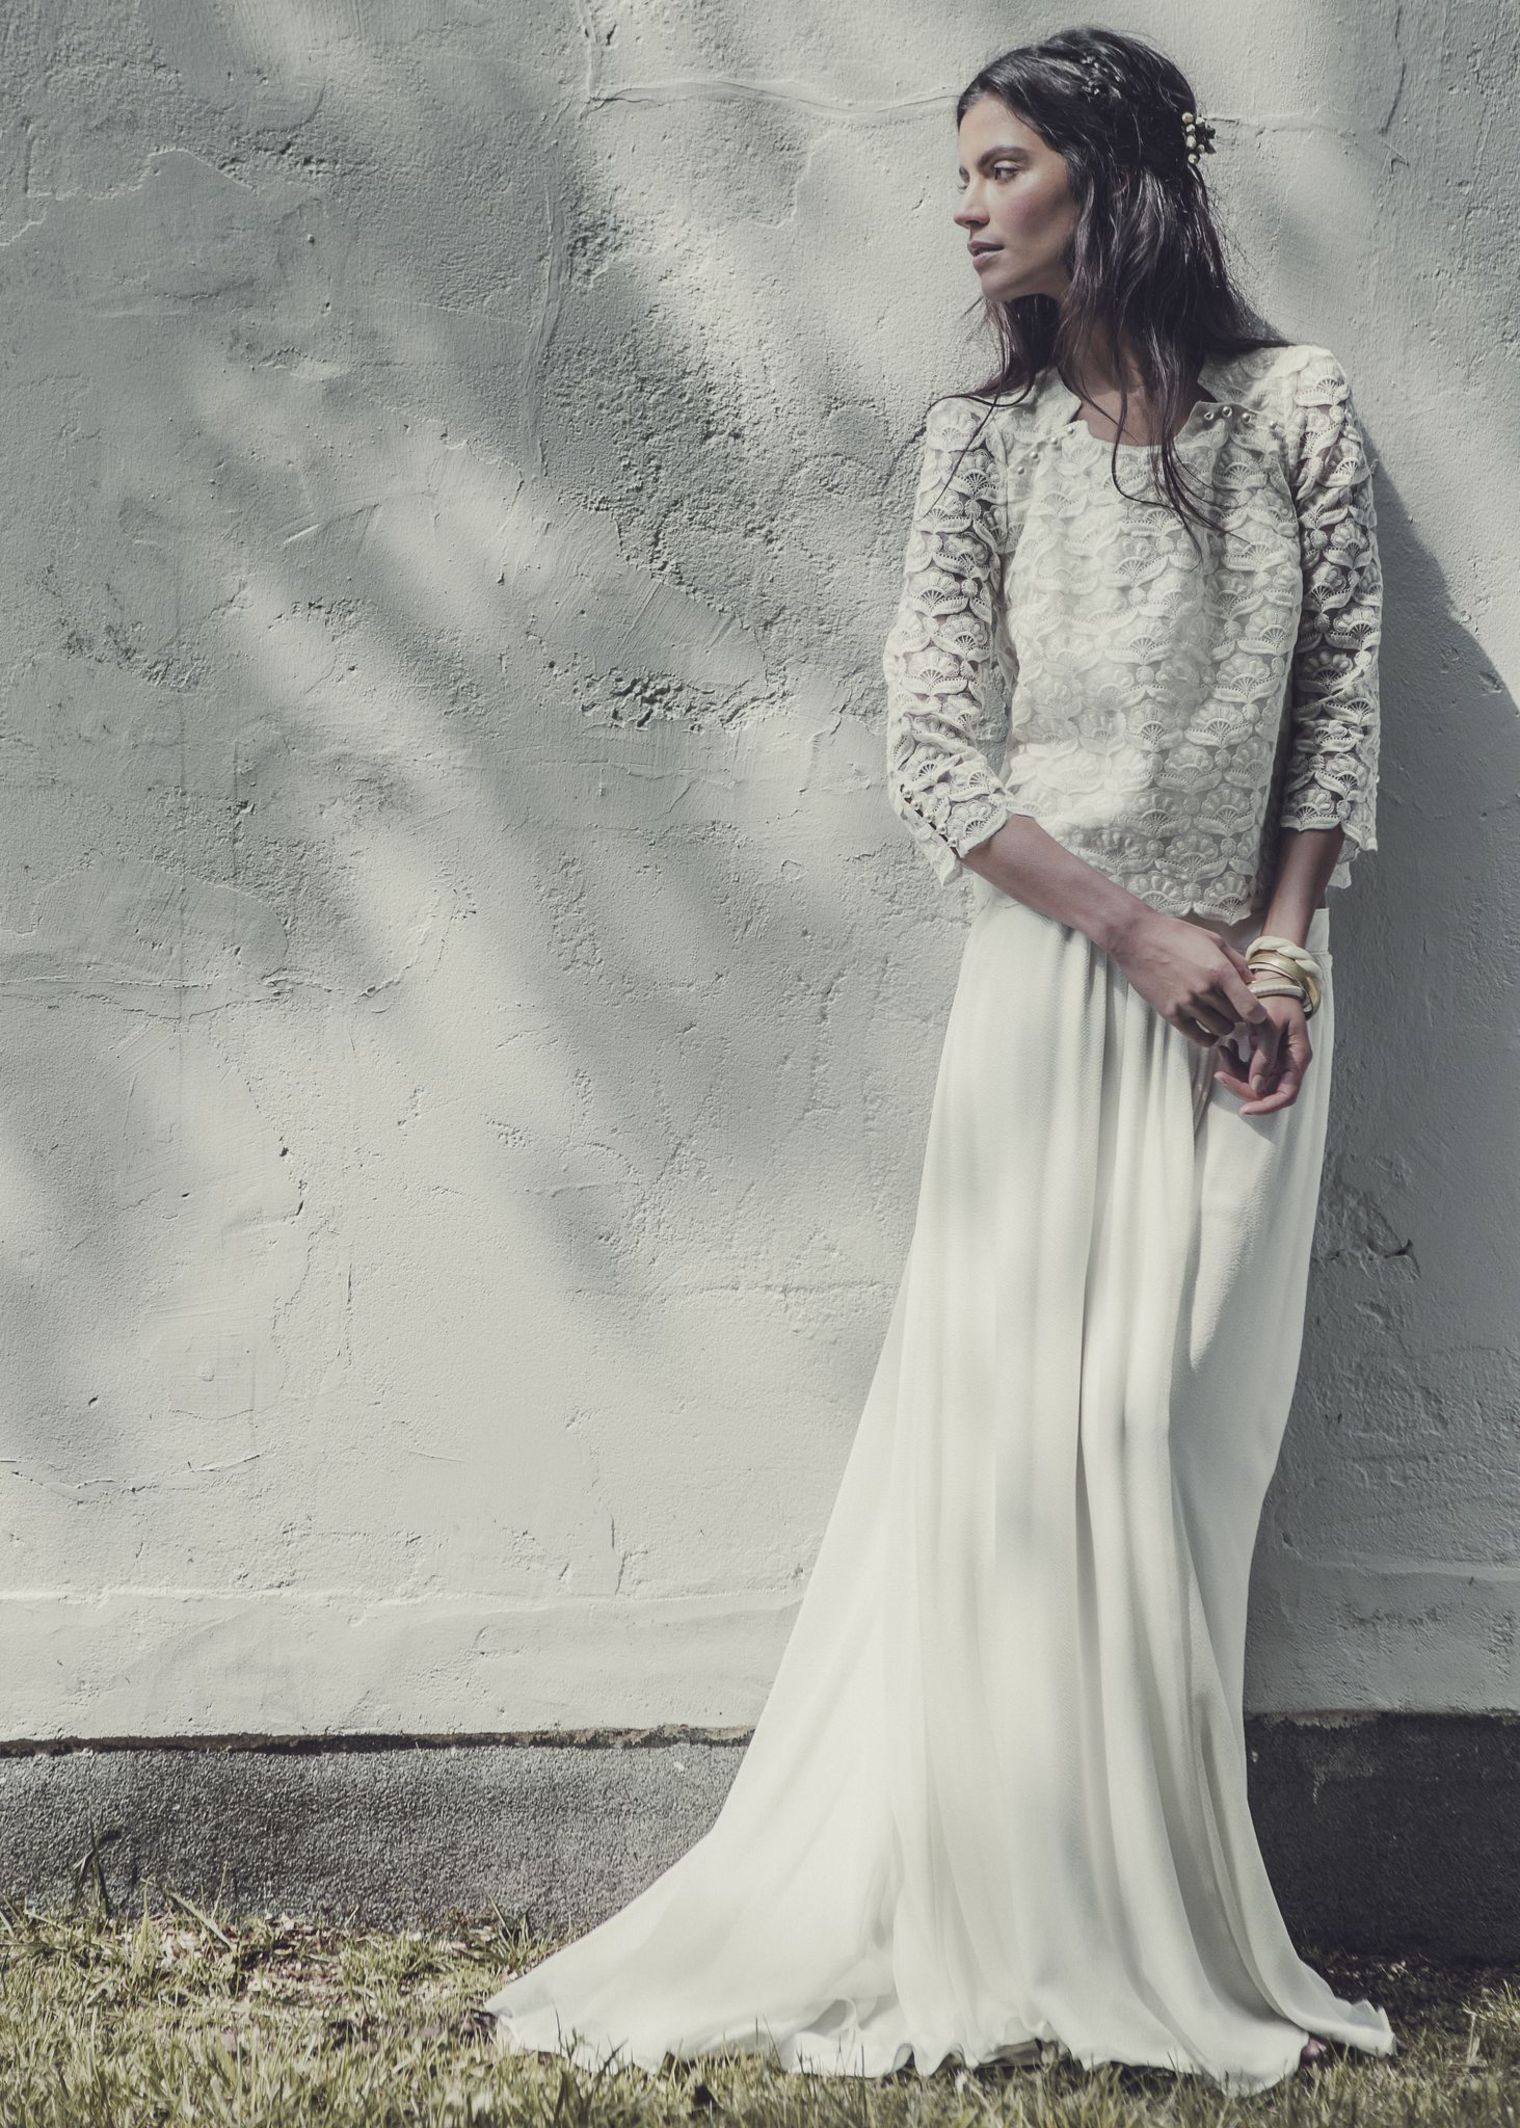 Creatrice robe mariee laure de sagazan